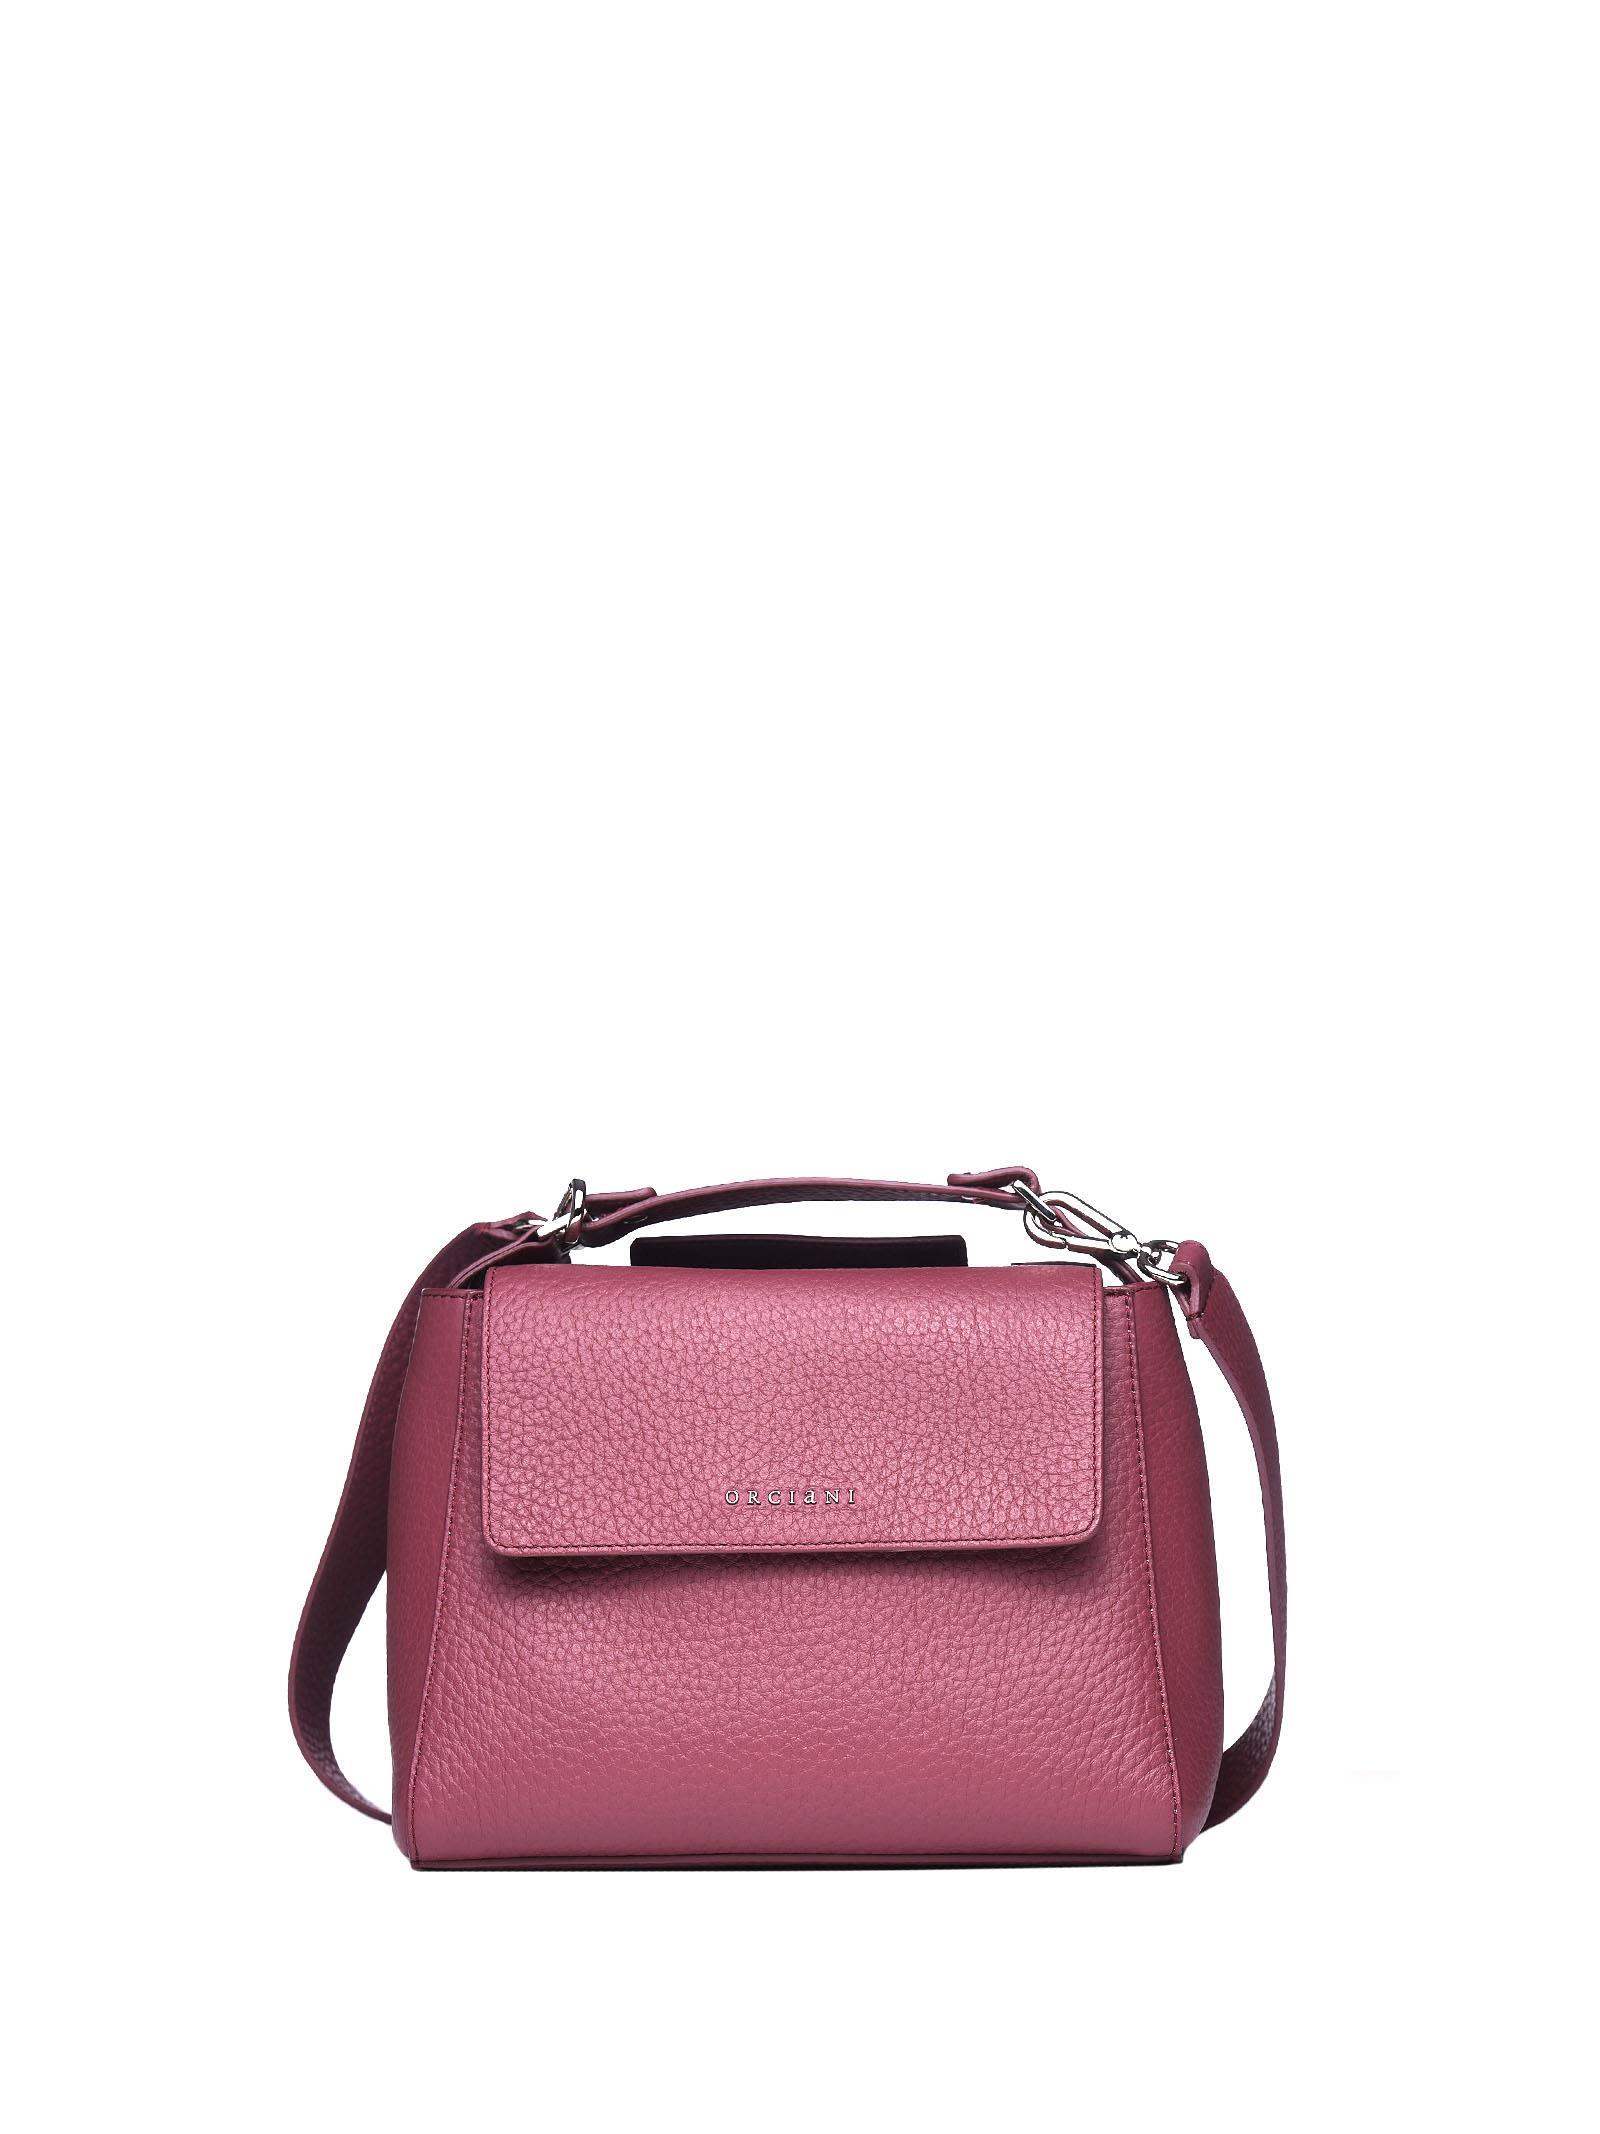 Orciani Sveva Small Leather Handbag In Terracotta  1ae137ce54e05